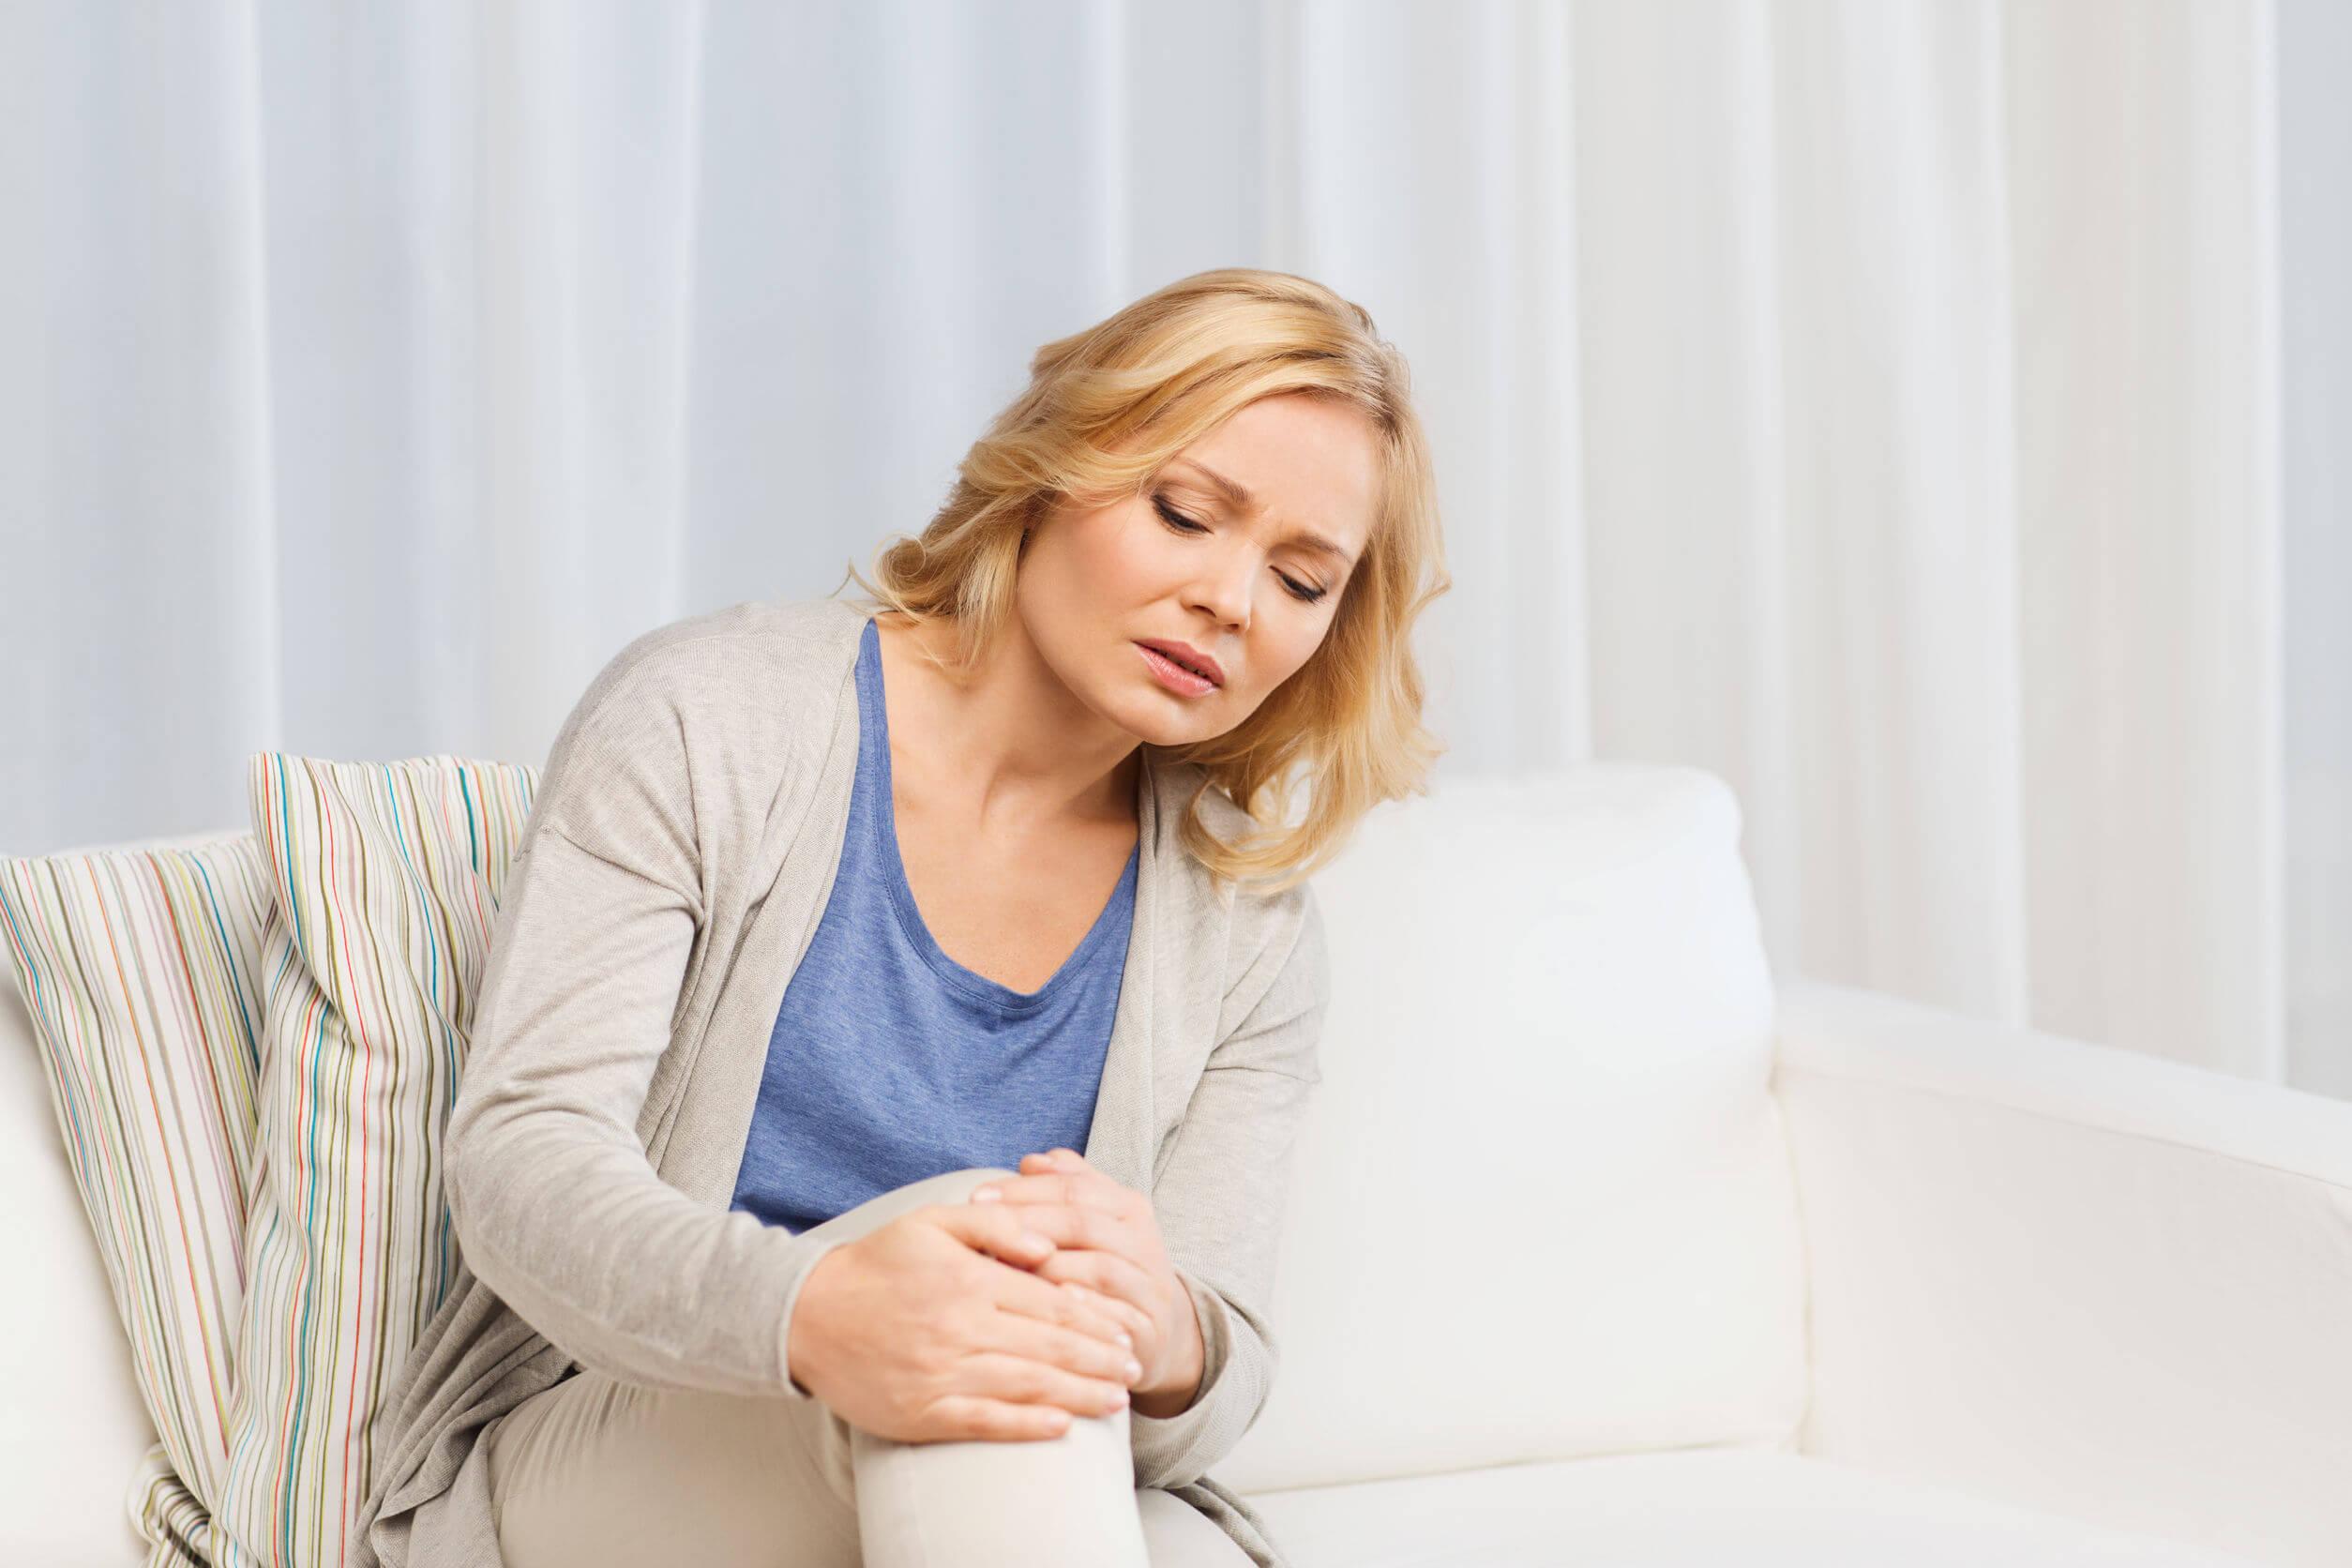 Mujer con dolor de rodilla por osteoartritis.